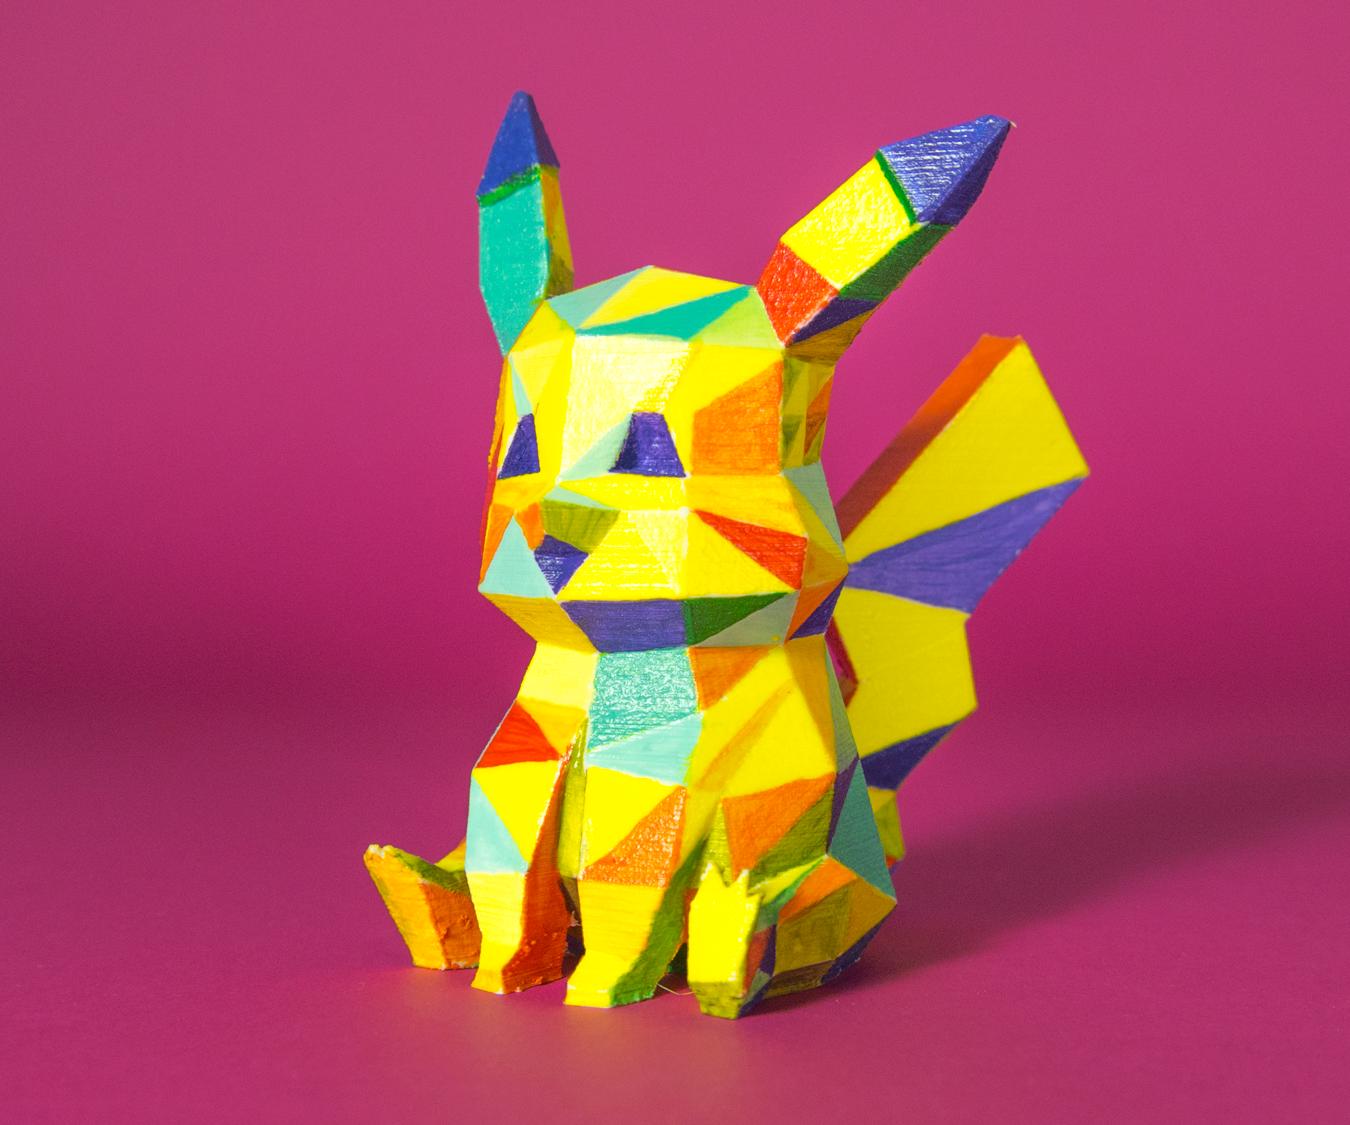 How to 3D print a Pikachu Pokemon